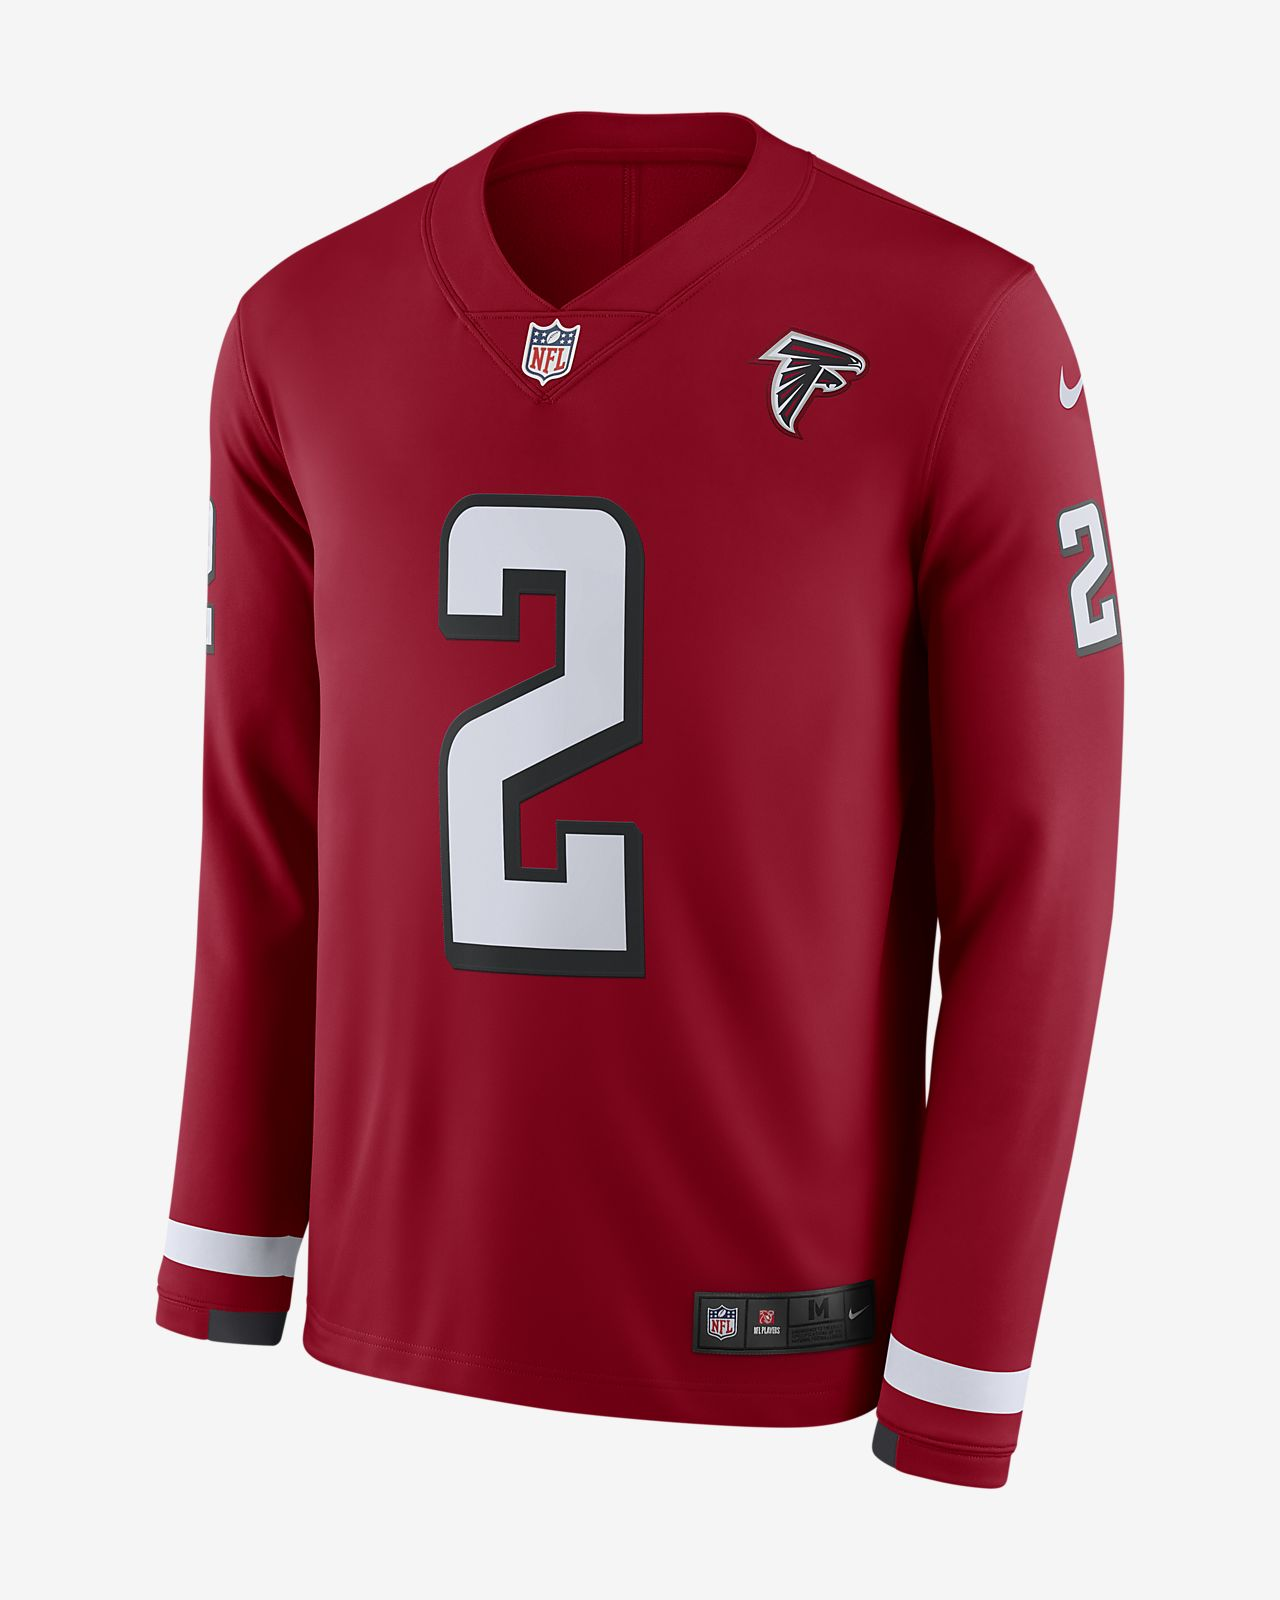 0e9401e5b90 NFL Atlanta Falcons Jersey (Matt Ryan) Men s Long-Sleeve Football ...